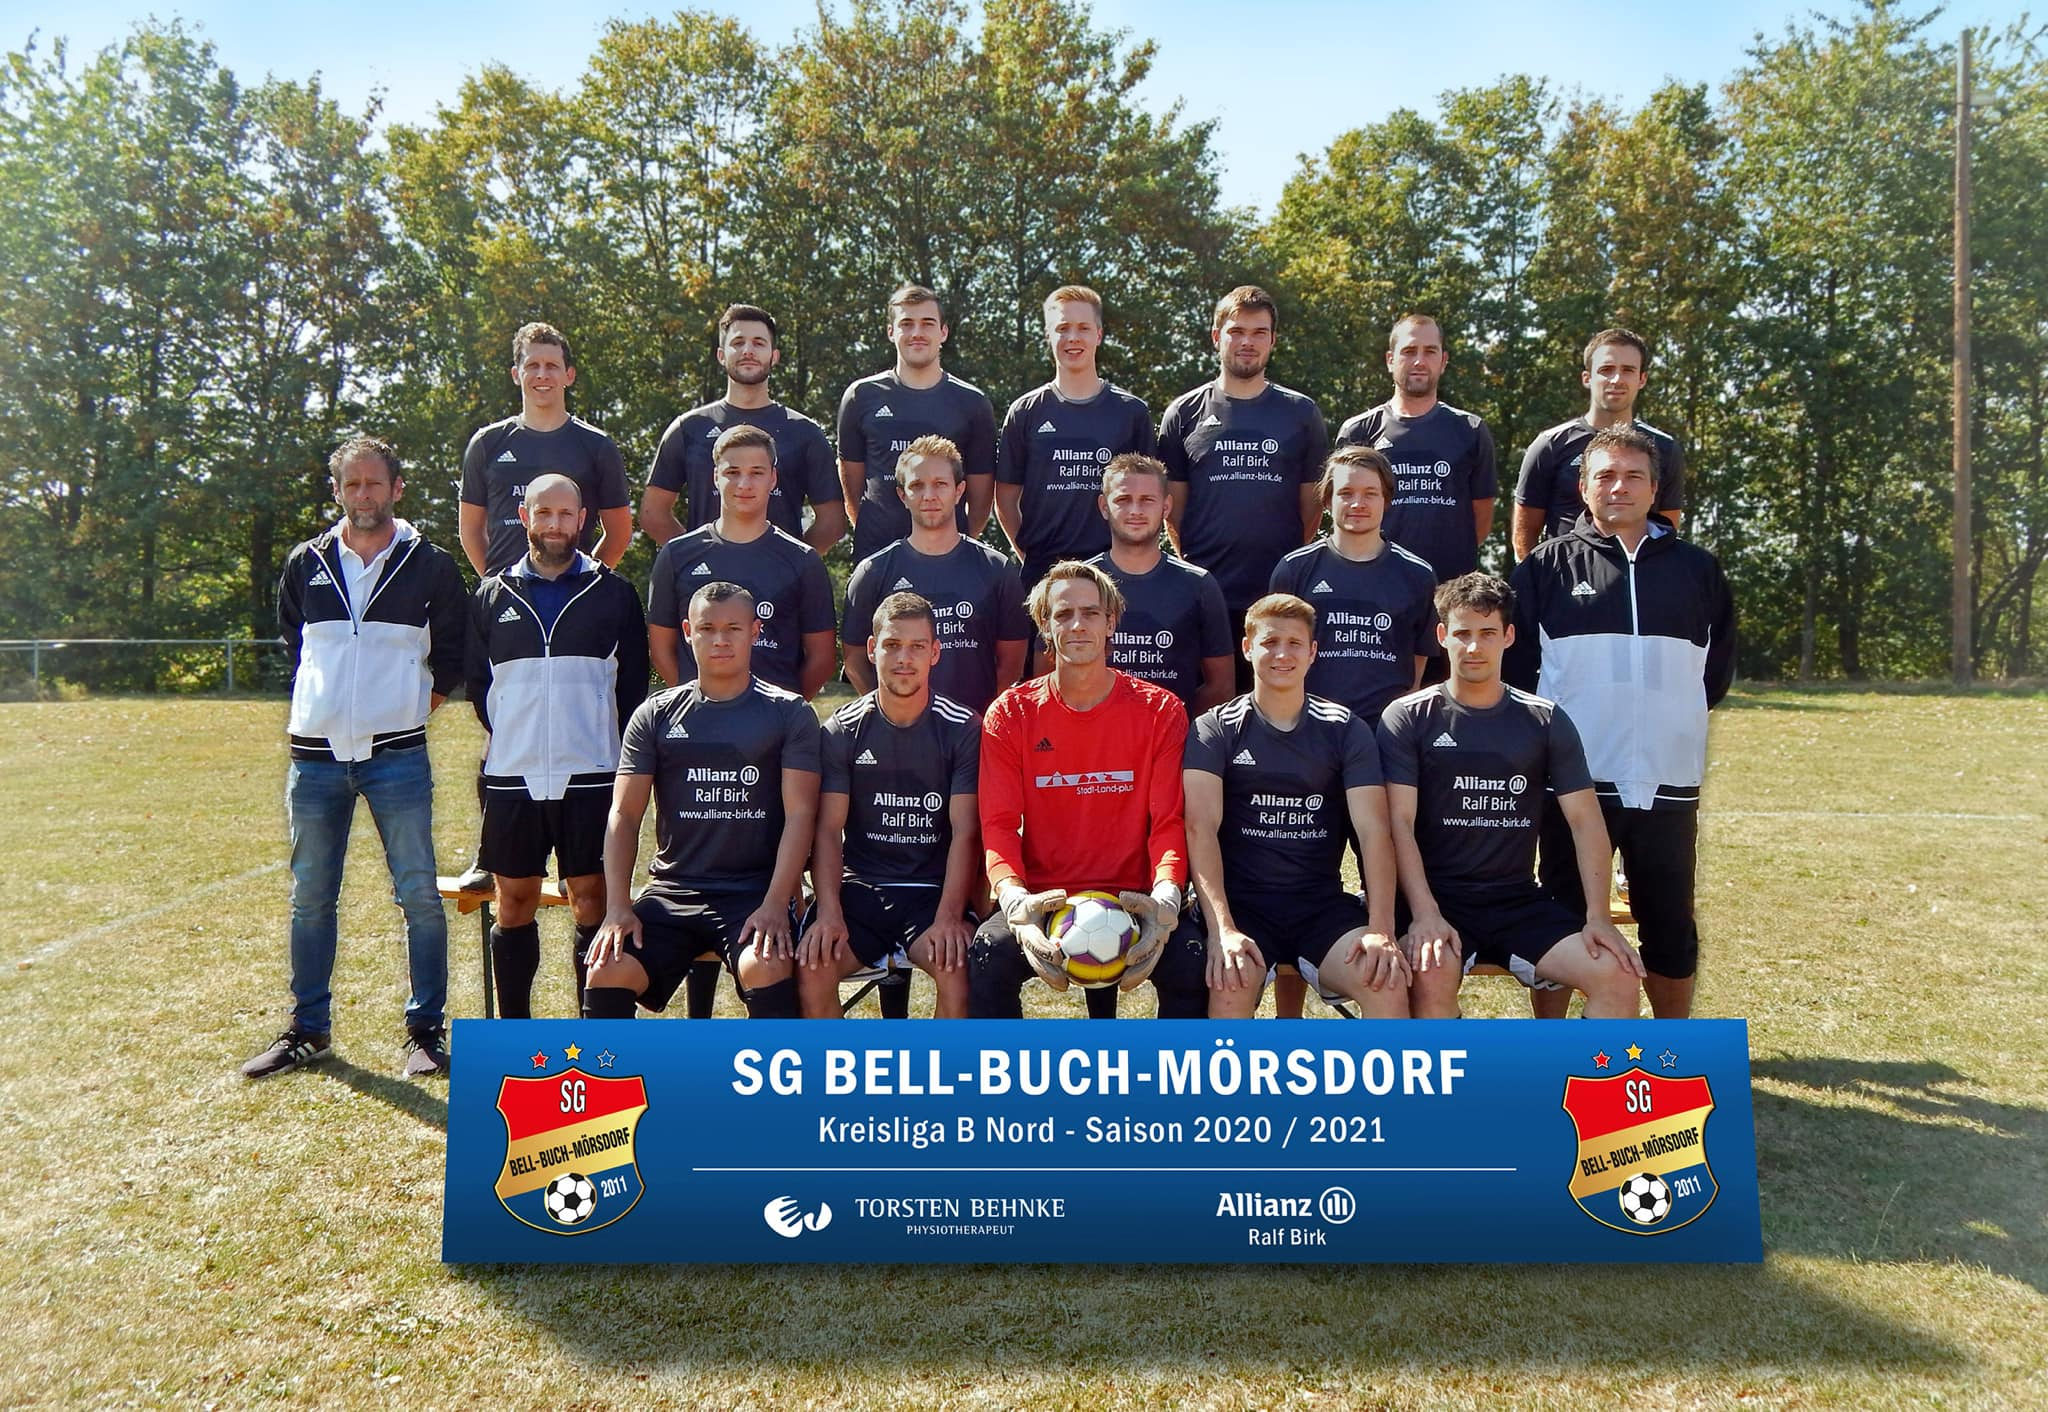 SG Bell-Buch-Mörsdorf Mannschaftsfoto der Saison 2020/21